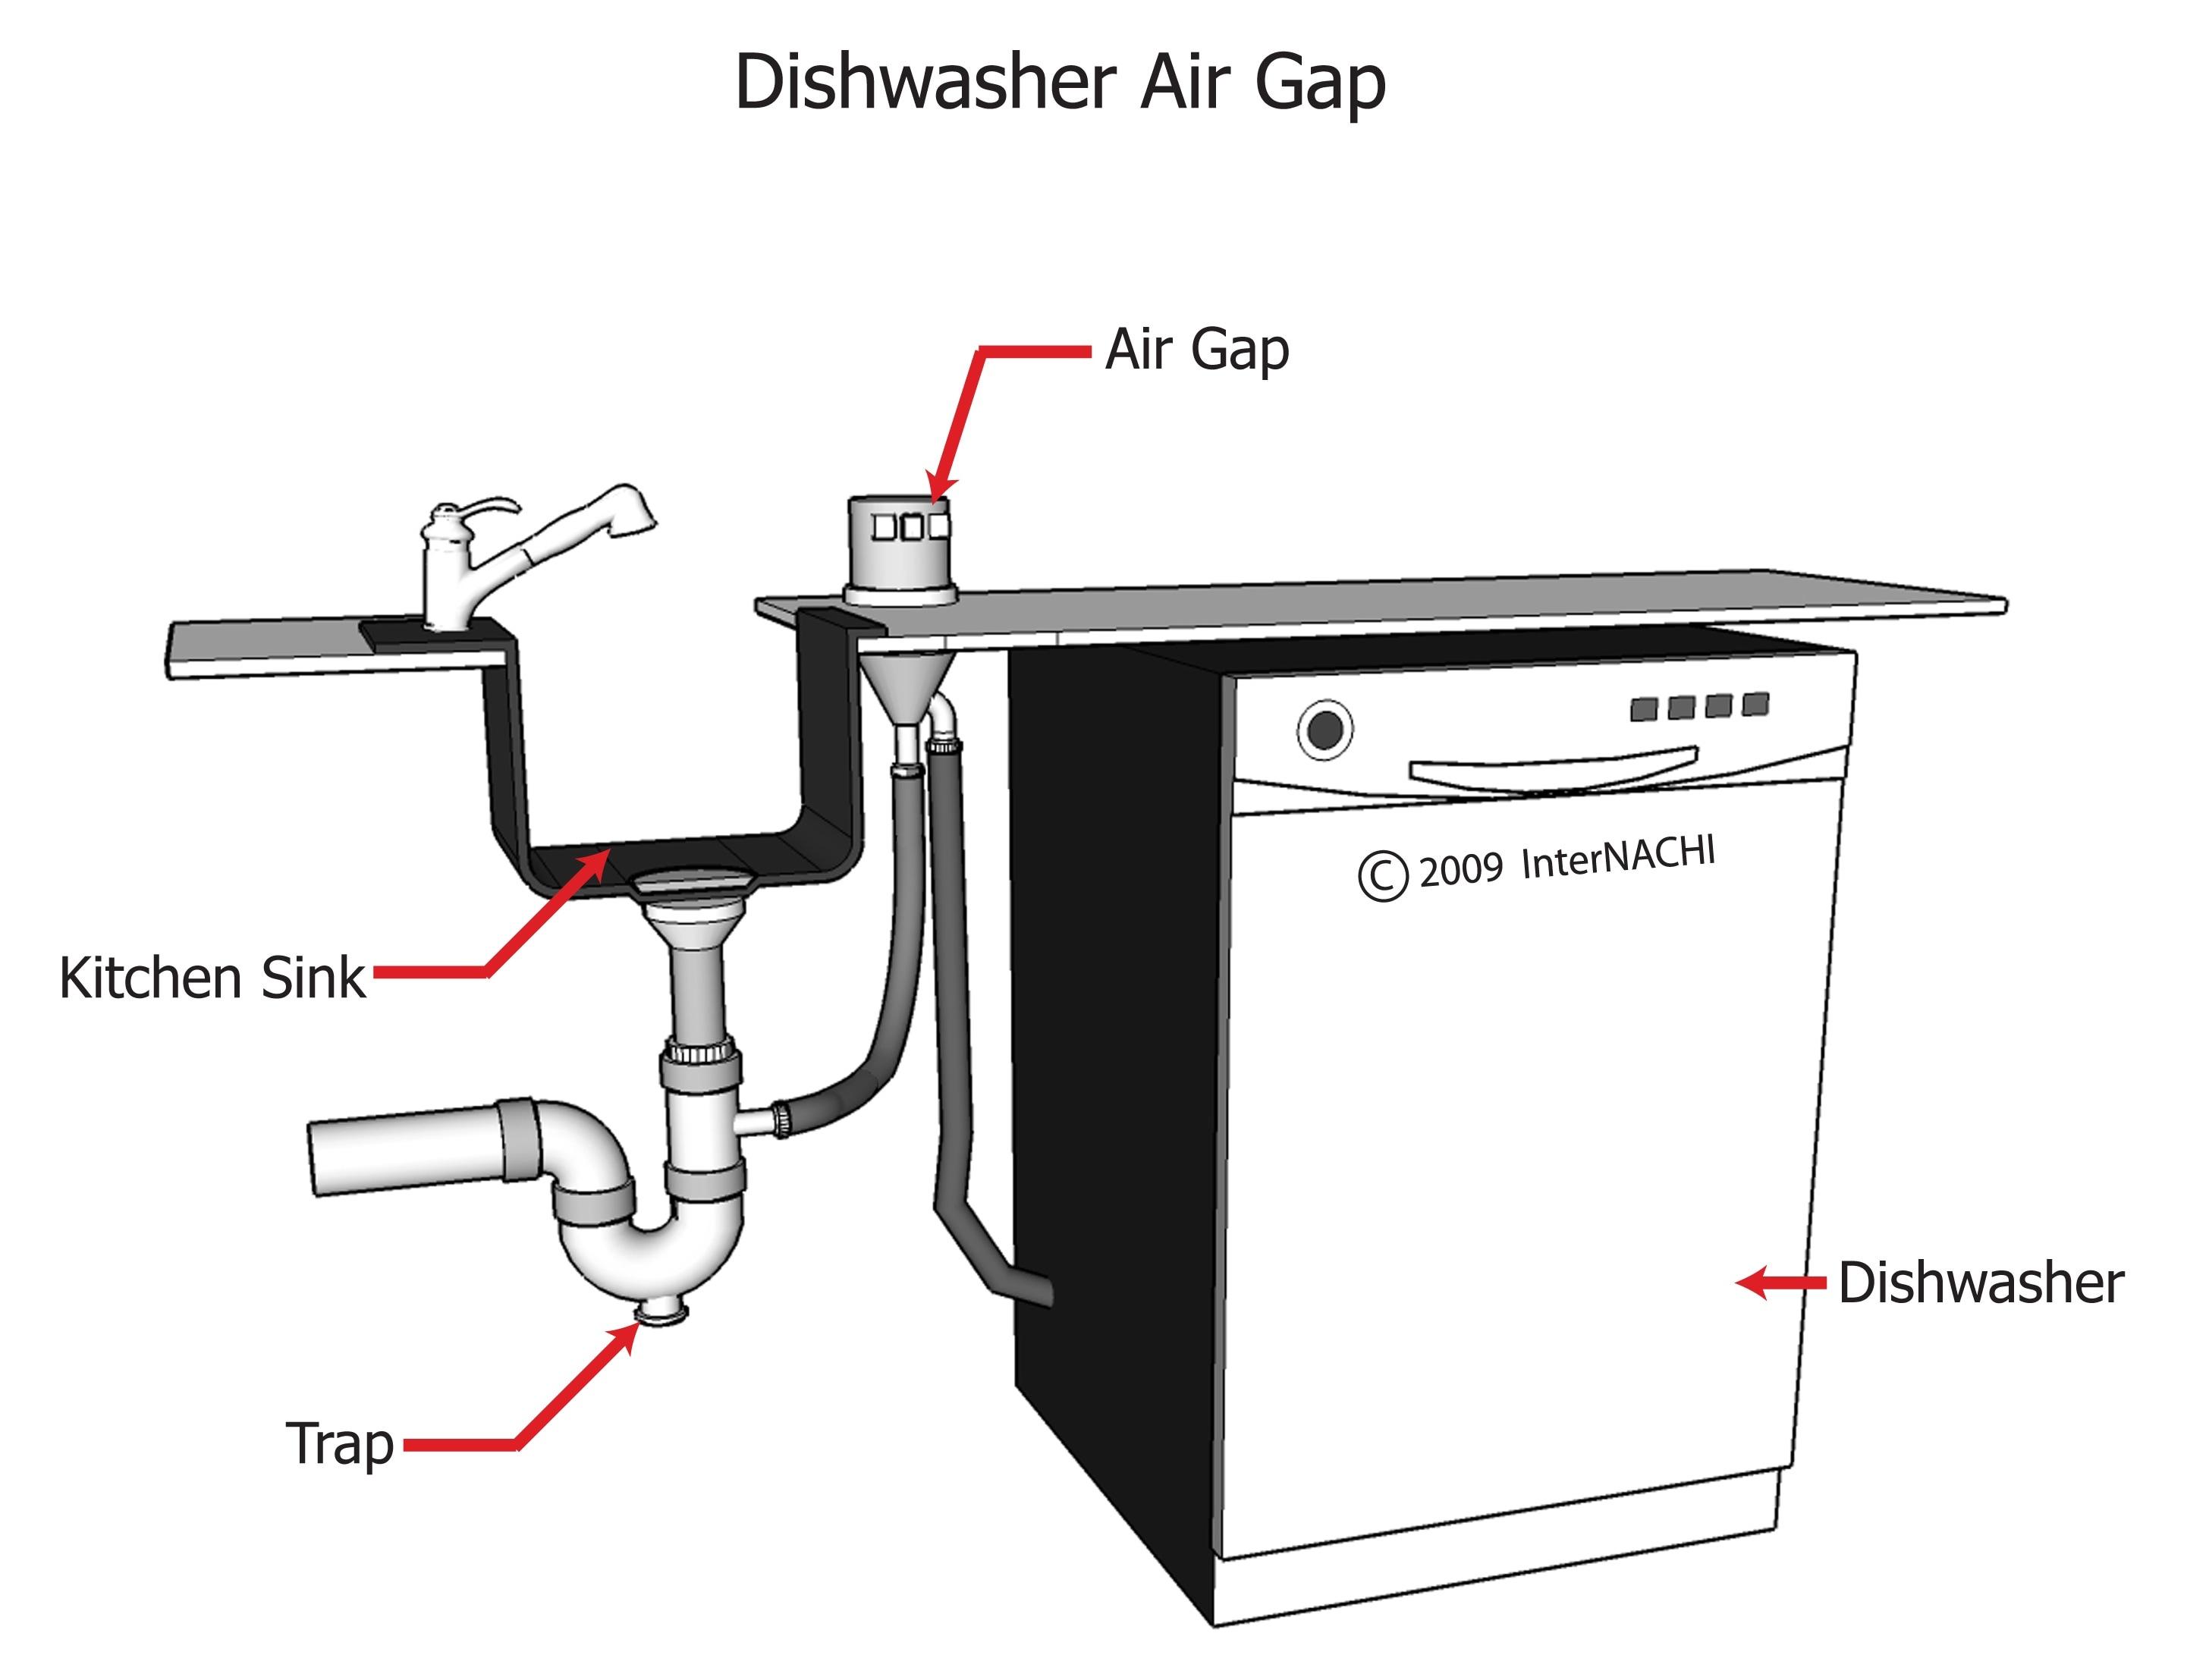 Dishwasher air gap.